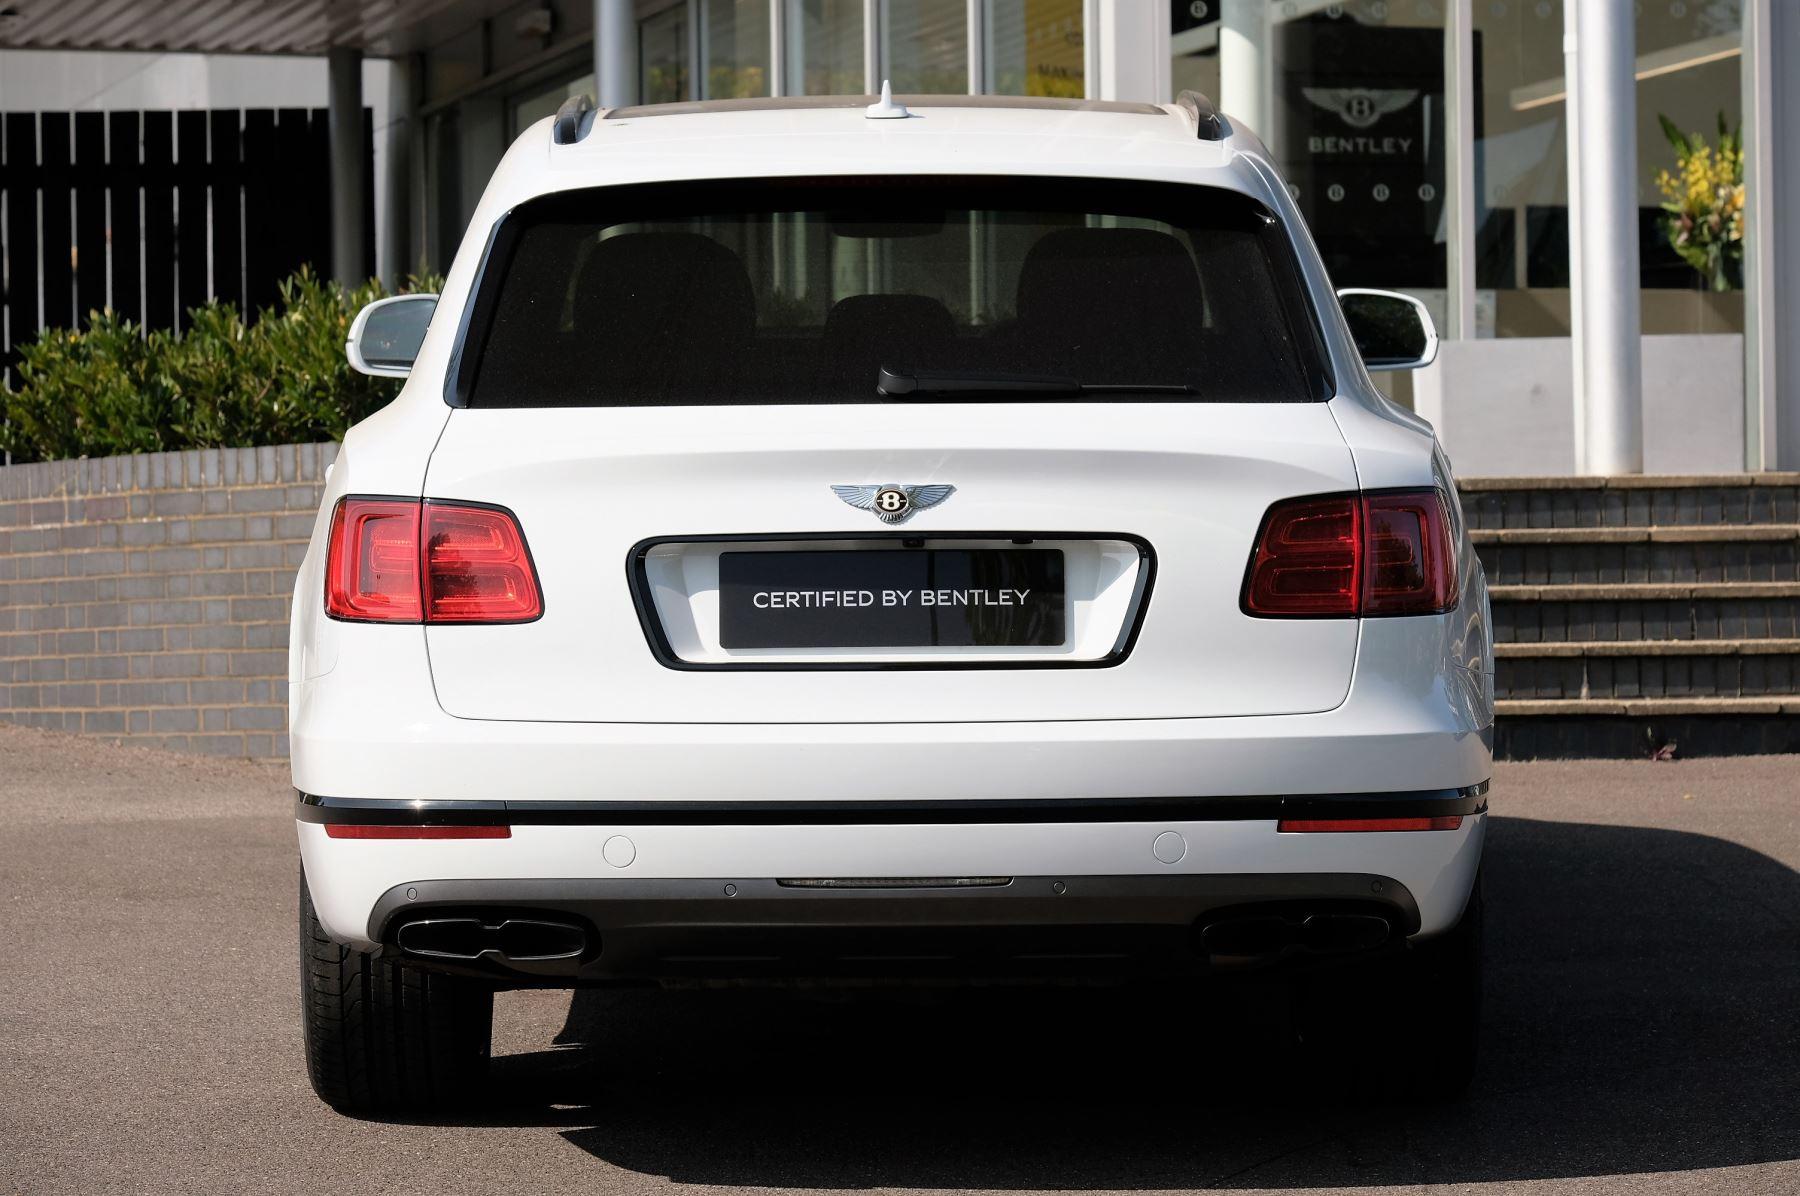 Bentley Bentayga V8 4.0 Design Series 5dr image 4